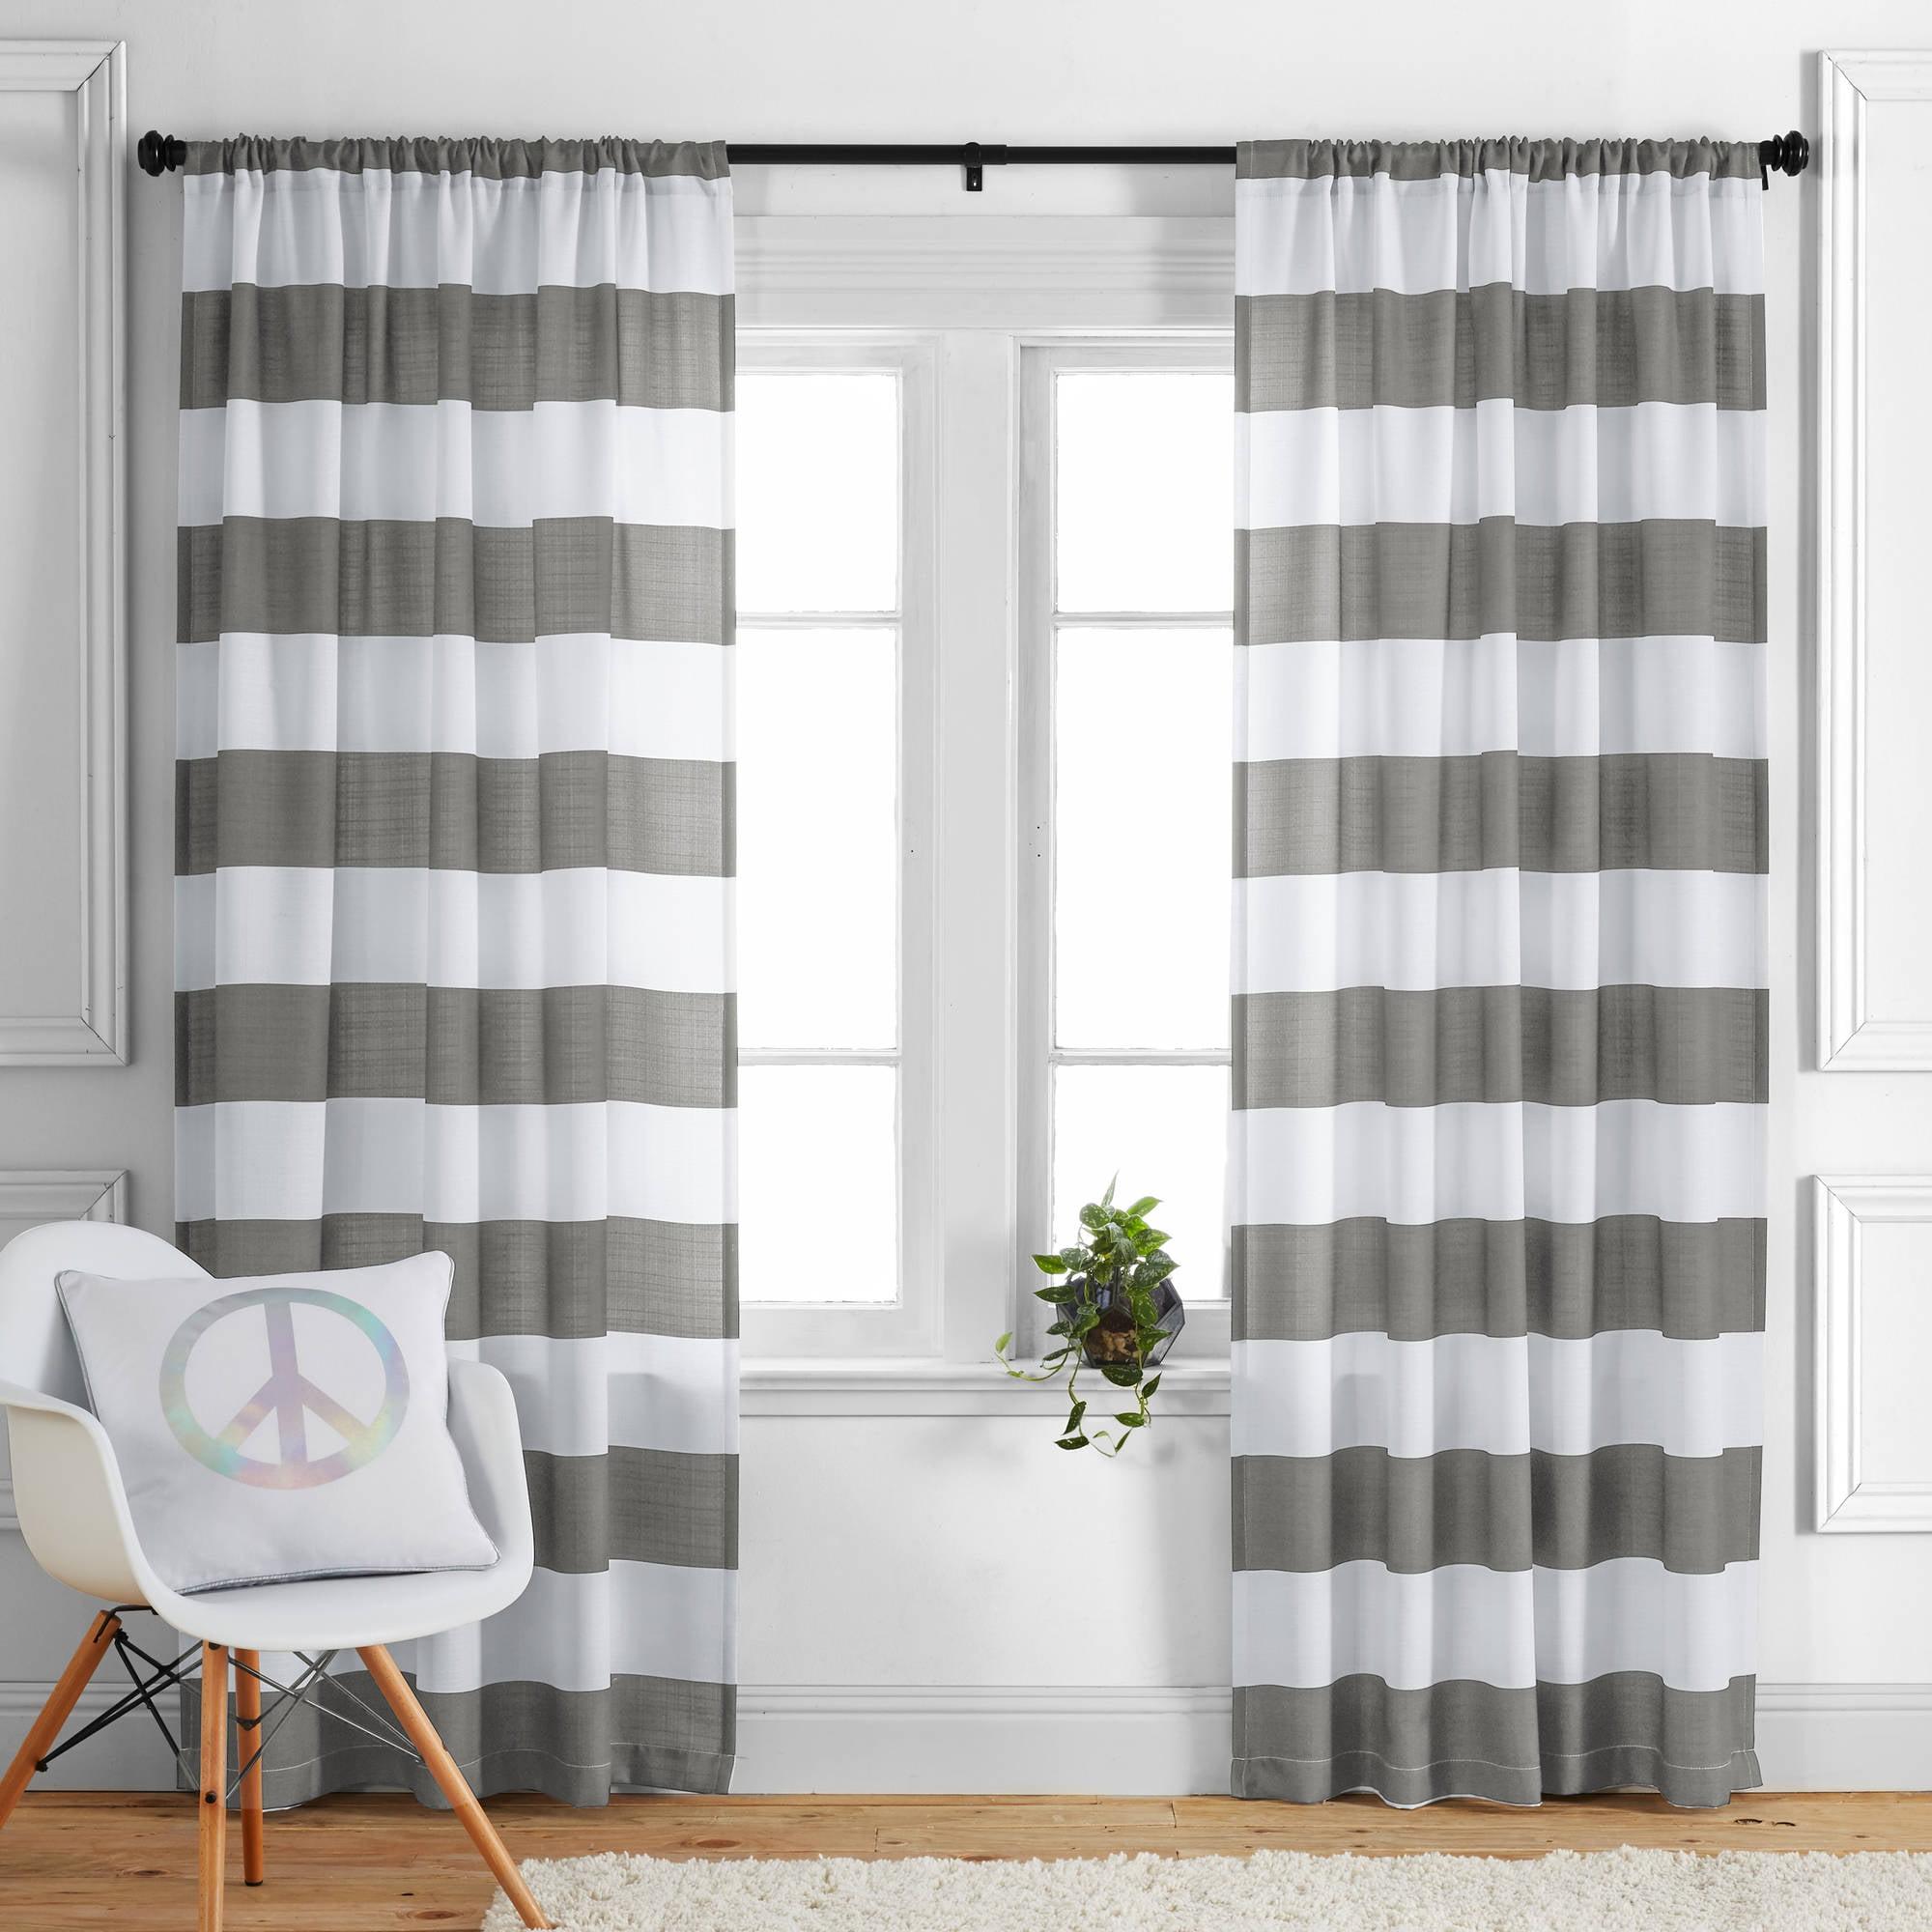 Better Homes and Gardens Stripes Curtain Panel - Walmart.com